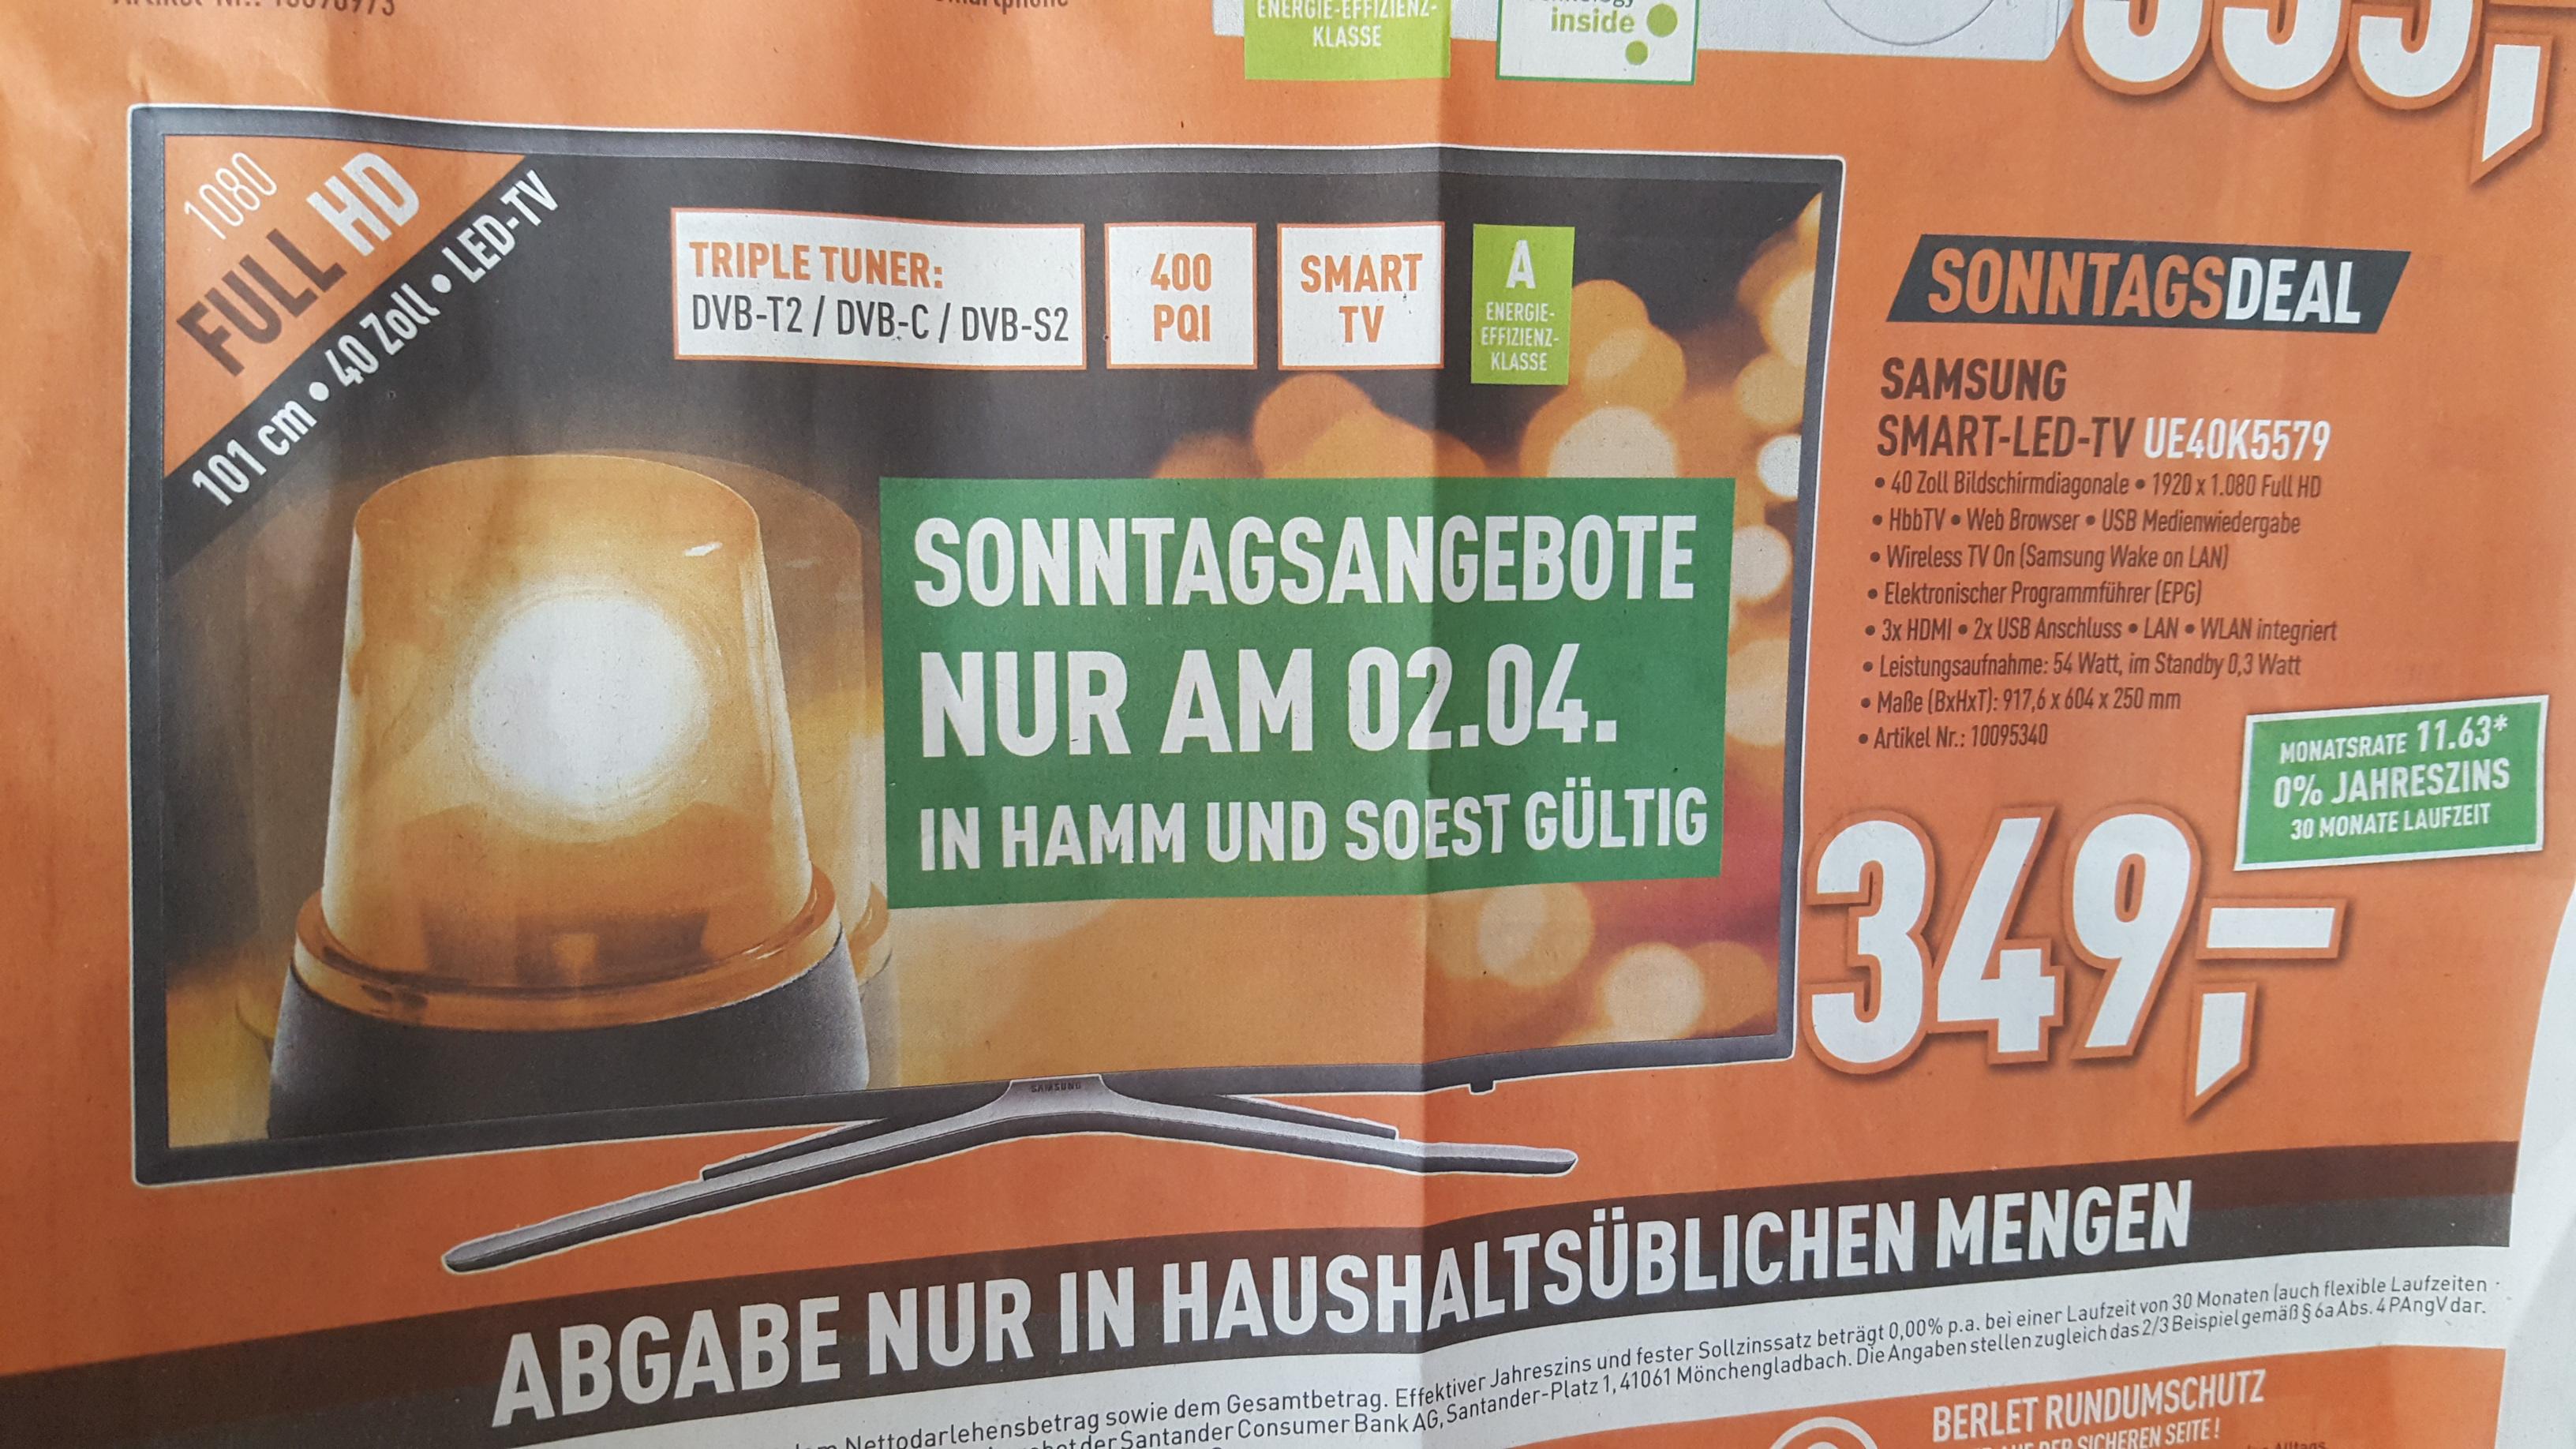 [Berlet - Lokal Soest und Hamm] Sonntagsangebot am 2.April Samsung K5579 UE40K5579, 101 cm (40 Zoll), Full-HD, SMART TV, LED TV, 400 PQI, DVB-T2 HD, DVB-C, DVB-S, DVB-S2 für 349€